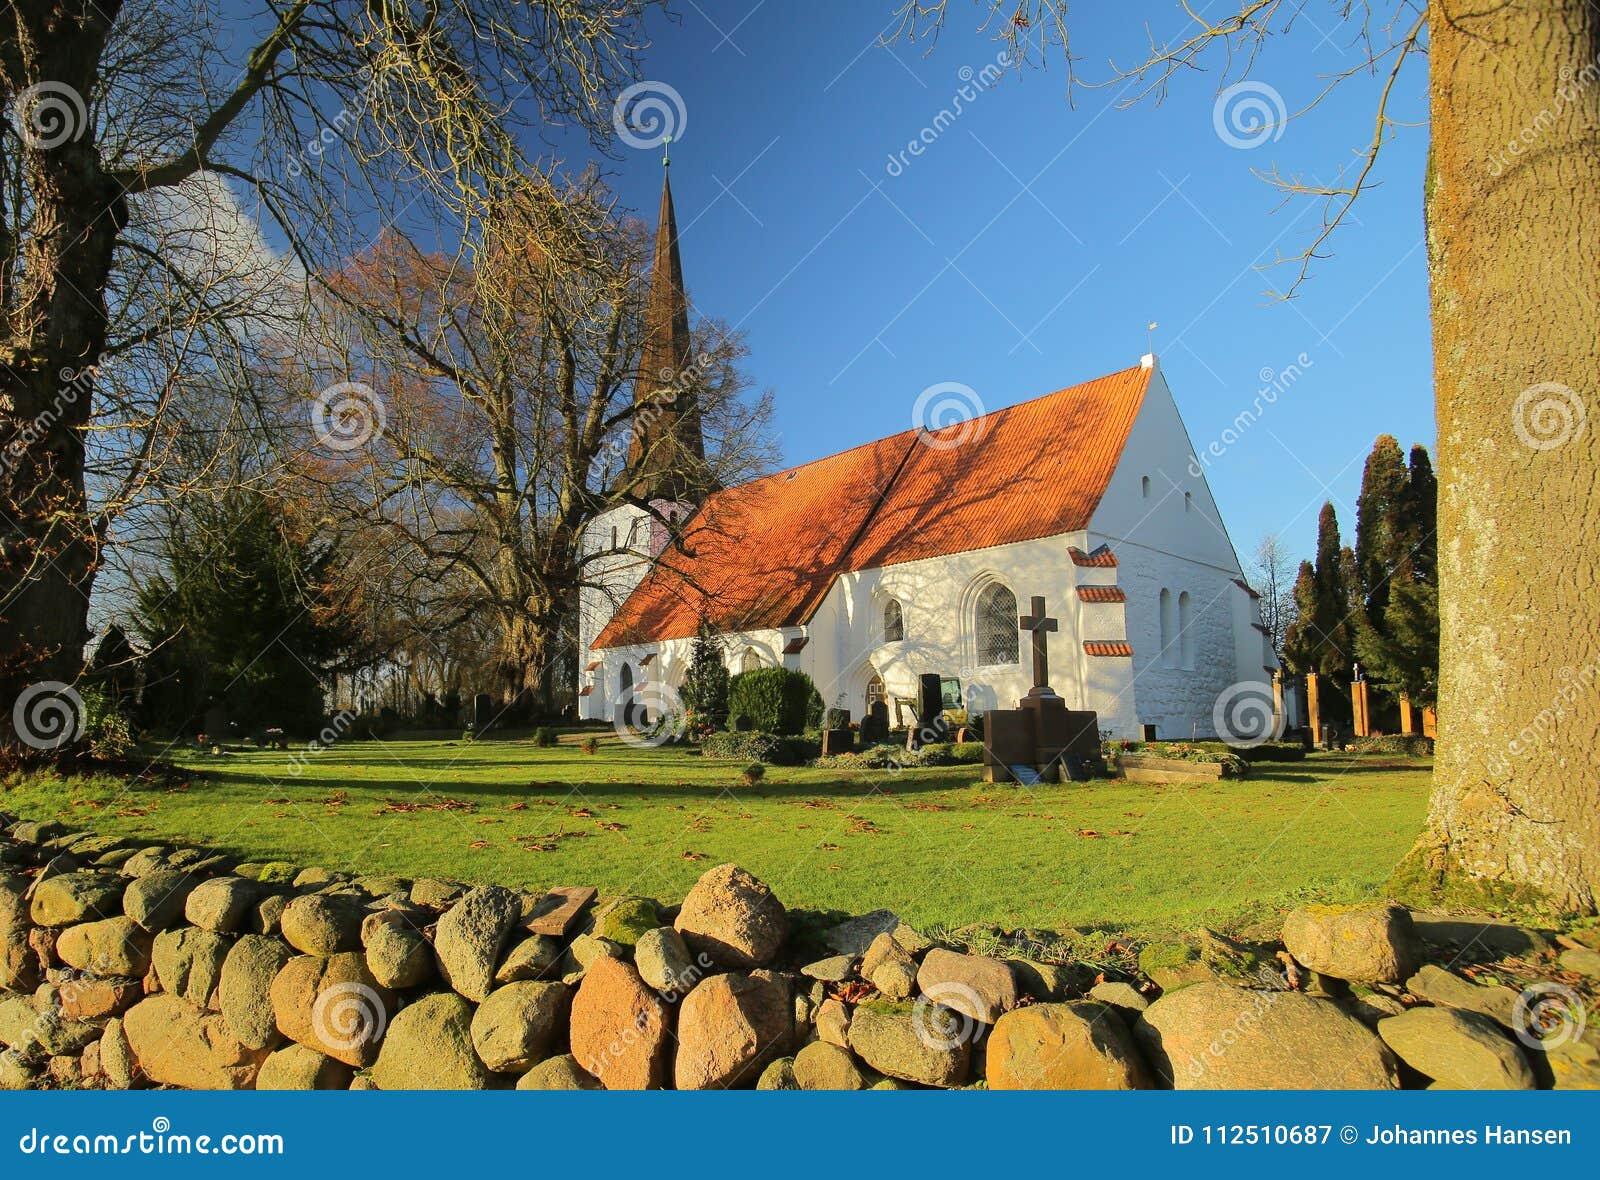 Igreja em Bisdorf bruto, Meclemburgo-Pomerania, Alemanha